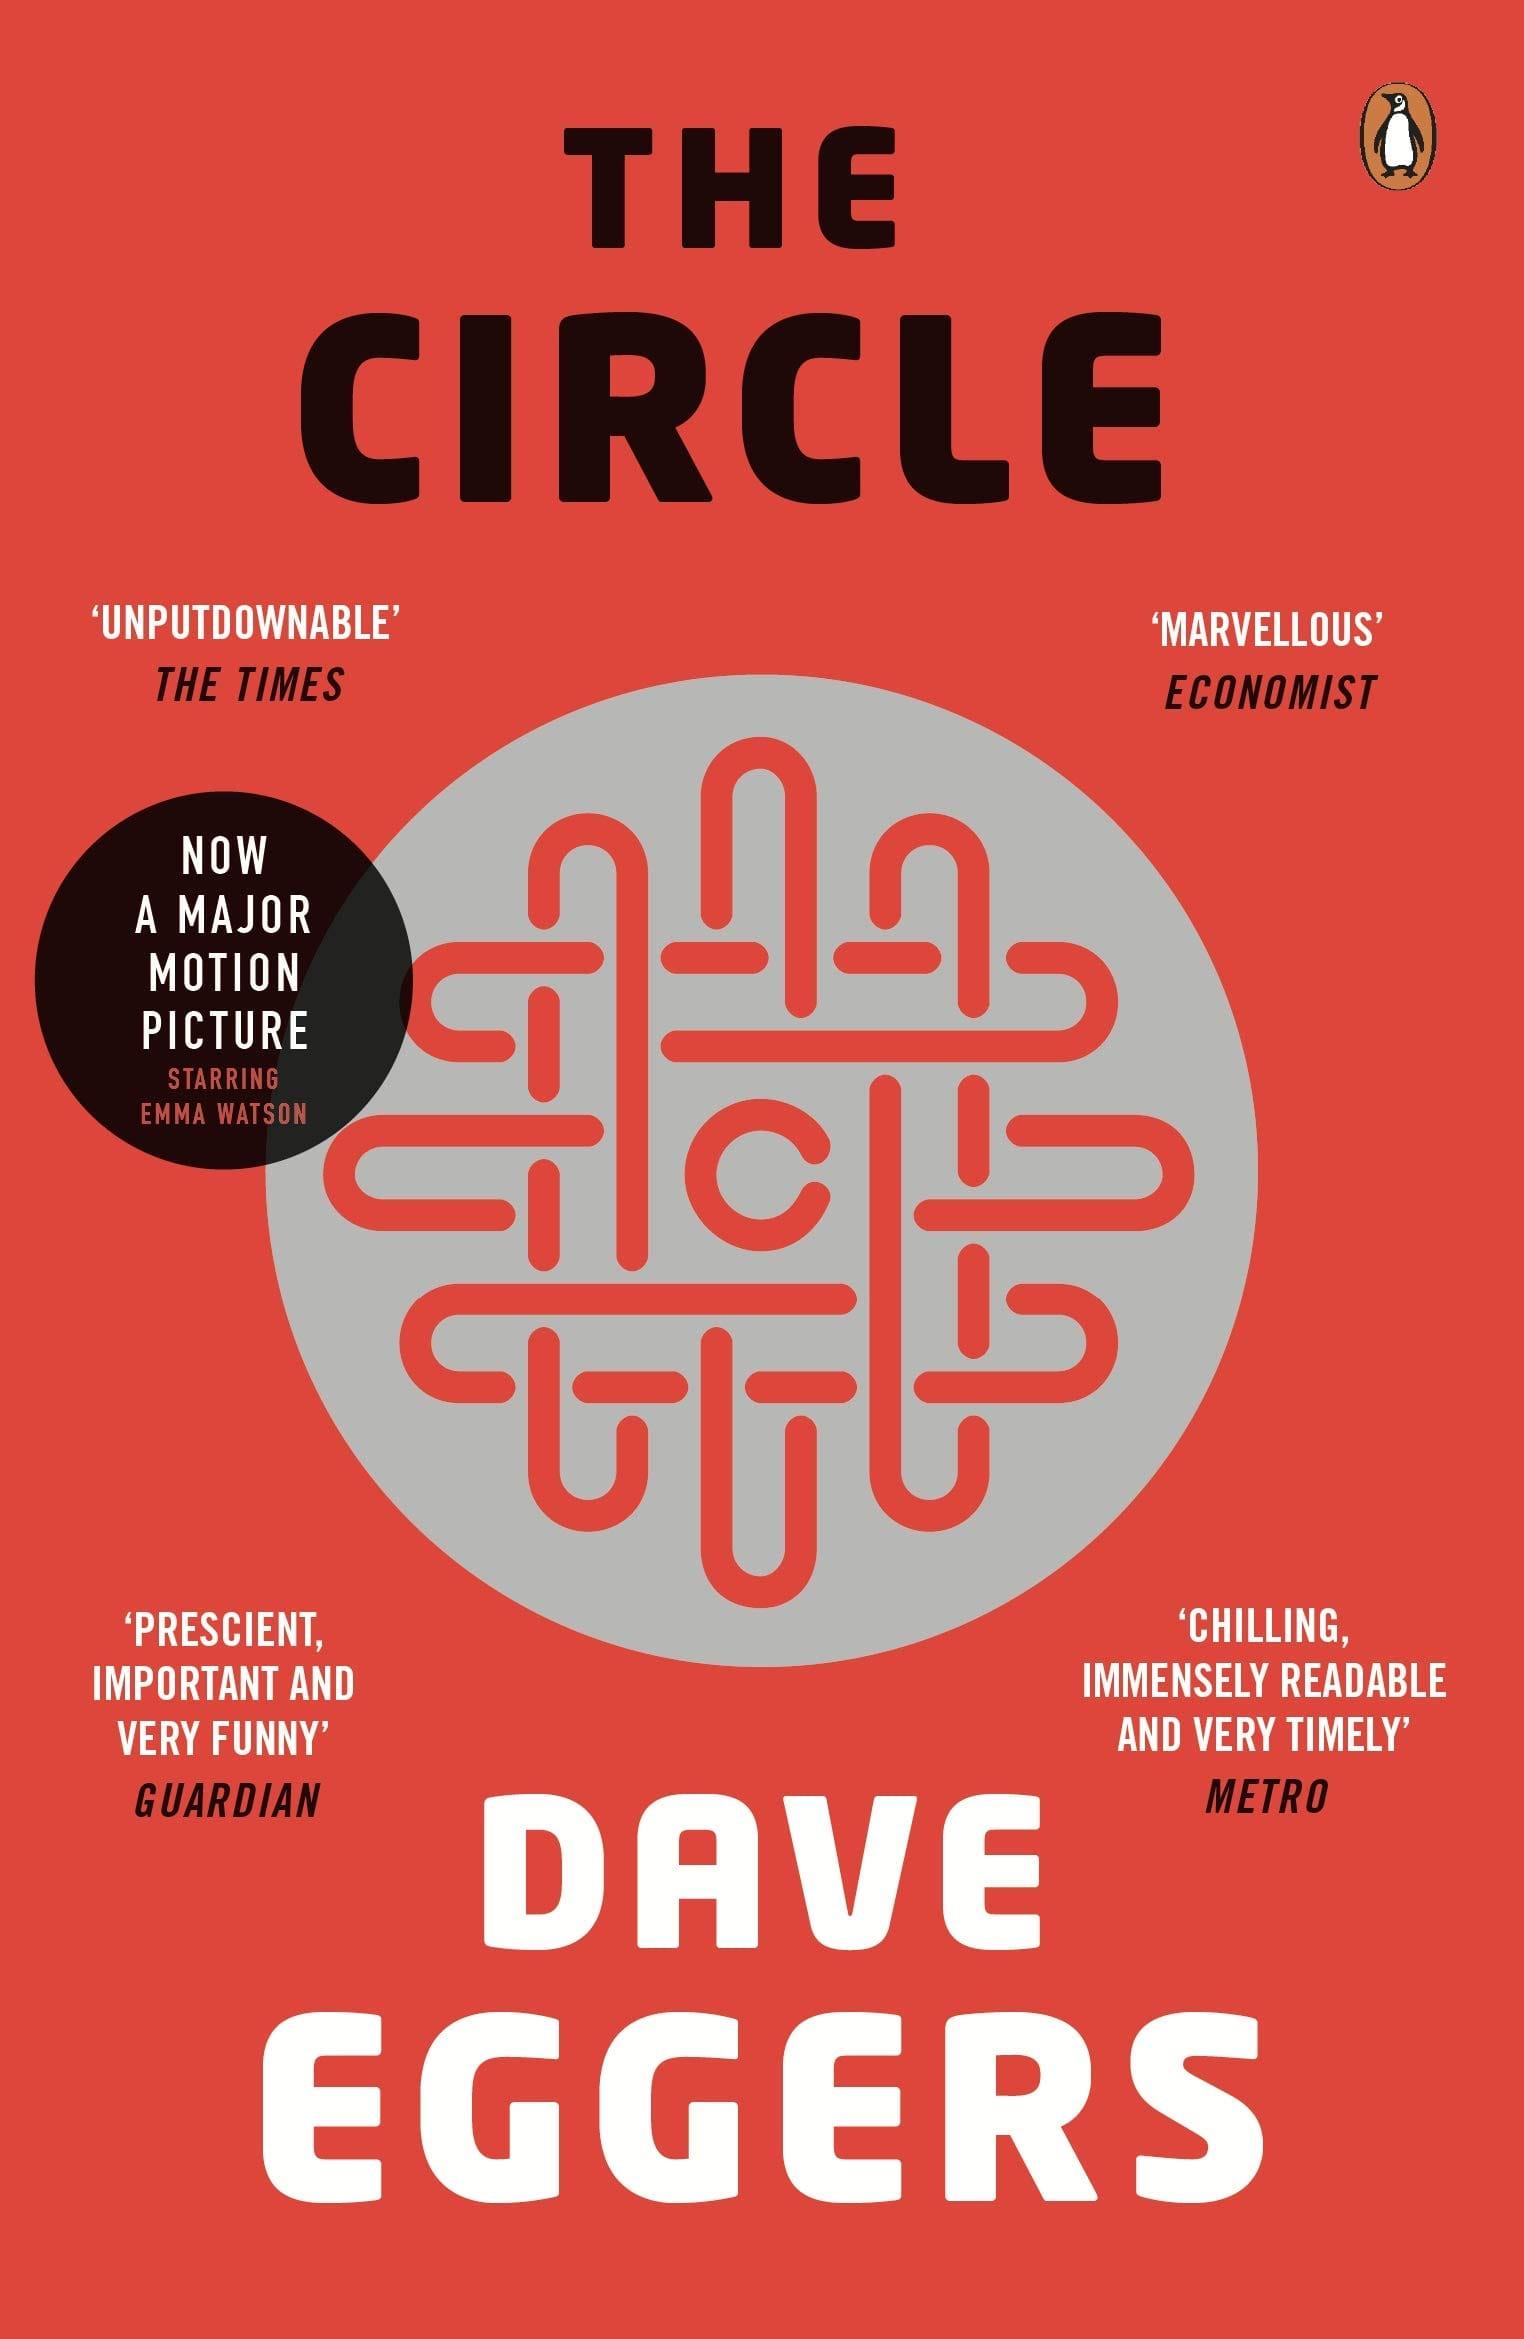 13-thecircle.jpg